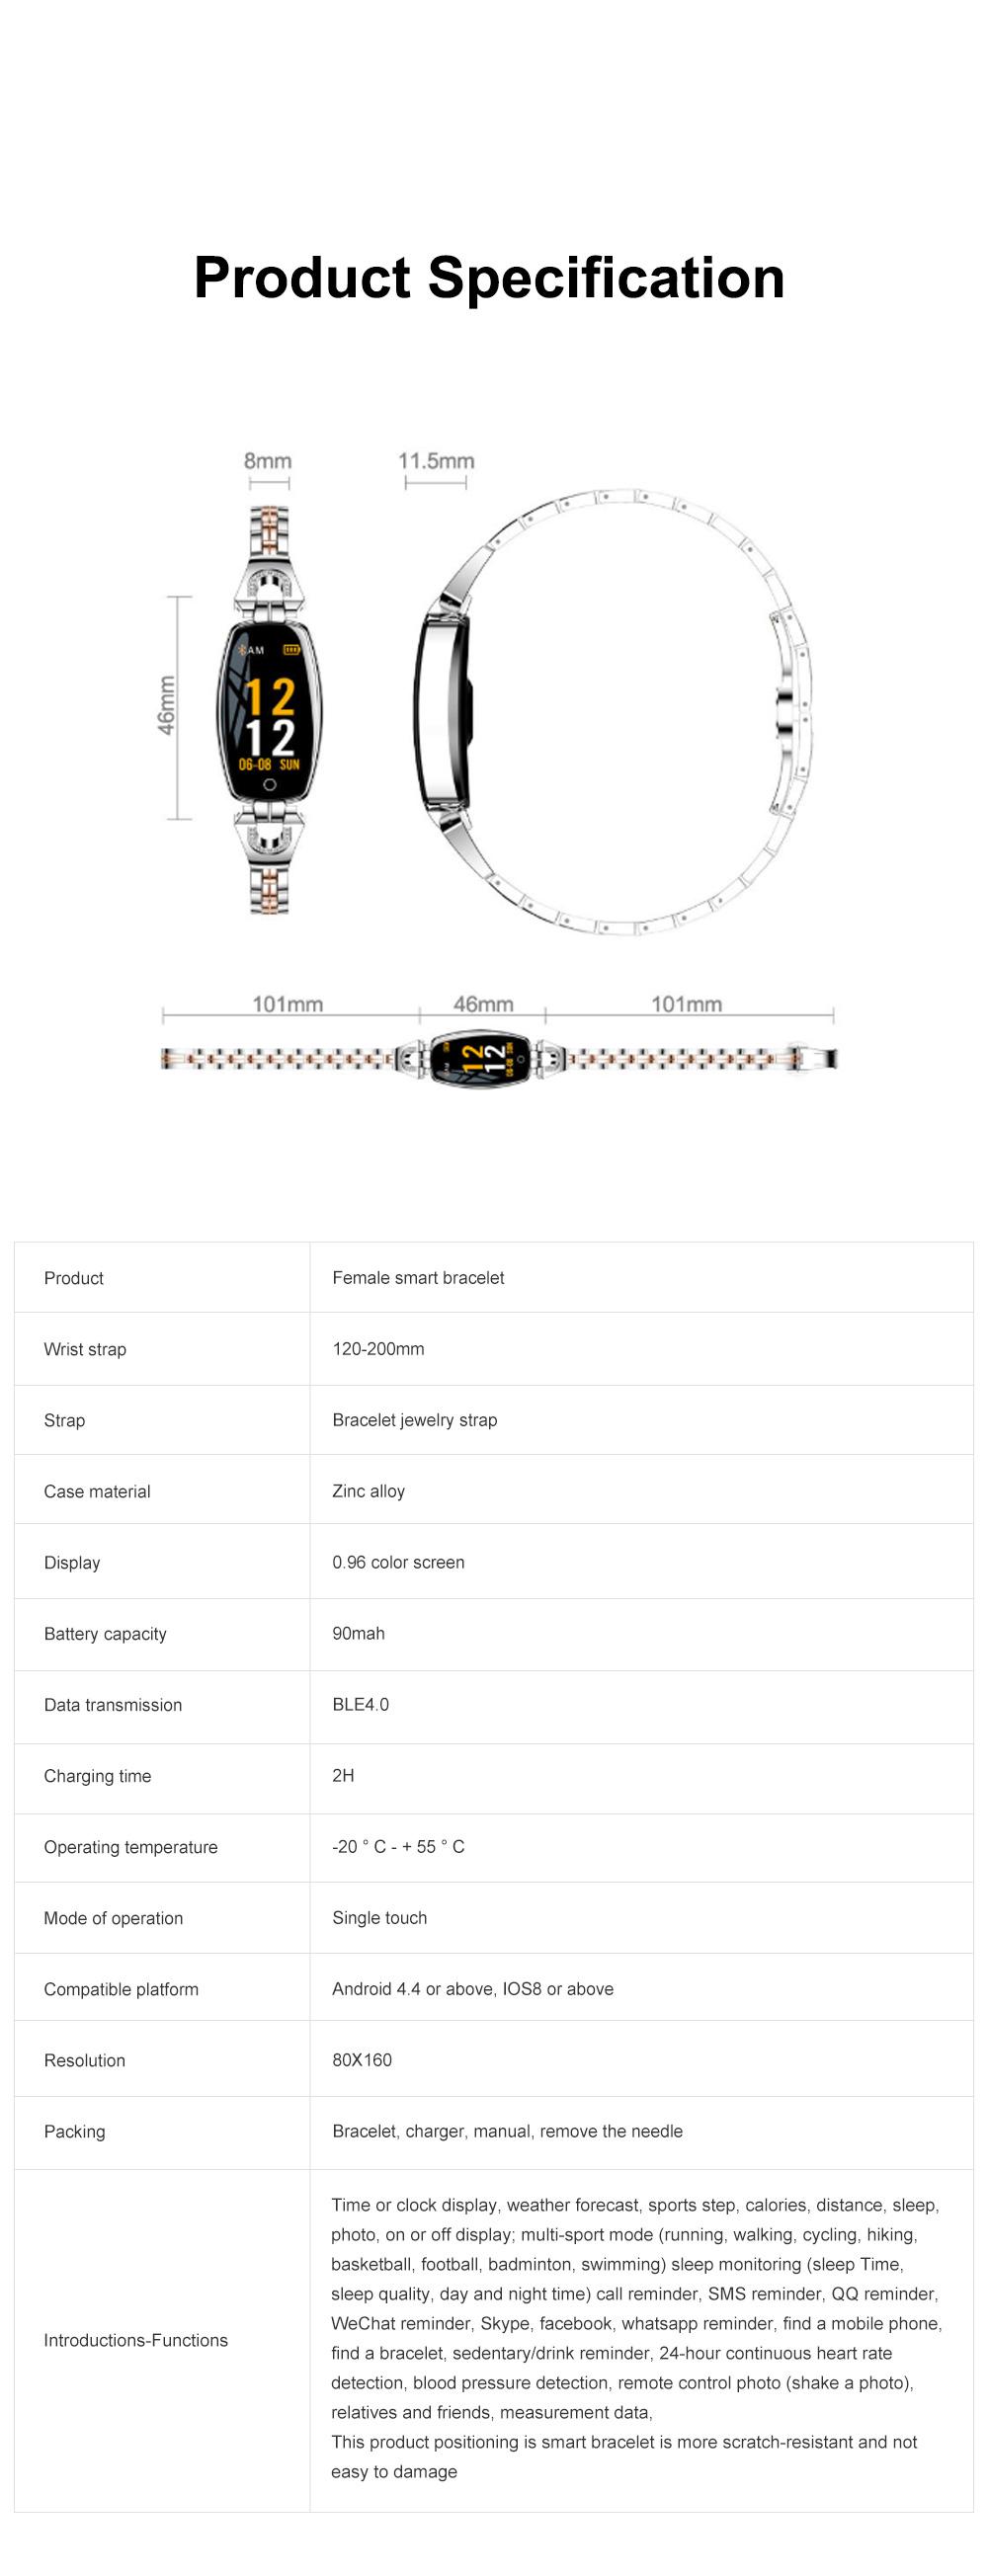 2019 Women Lady Fashion Smart Wristband H8 Heart Rate Blood Pressure Smart Bracelet Fitness Tracker Smart Watch Band Female Girl Gift 13